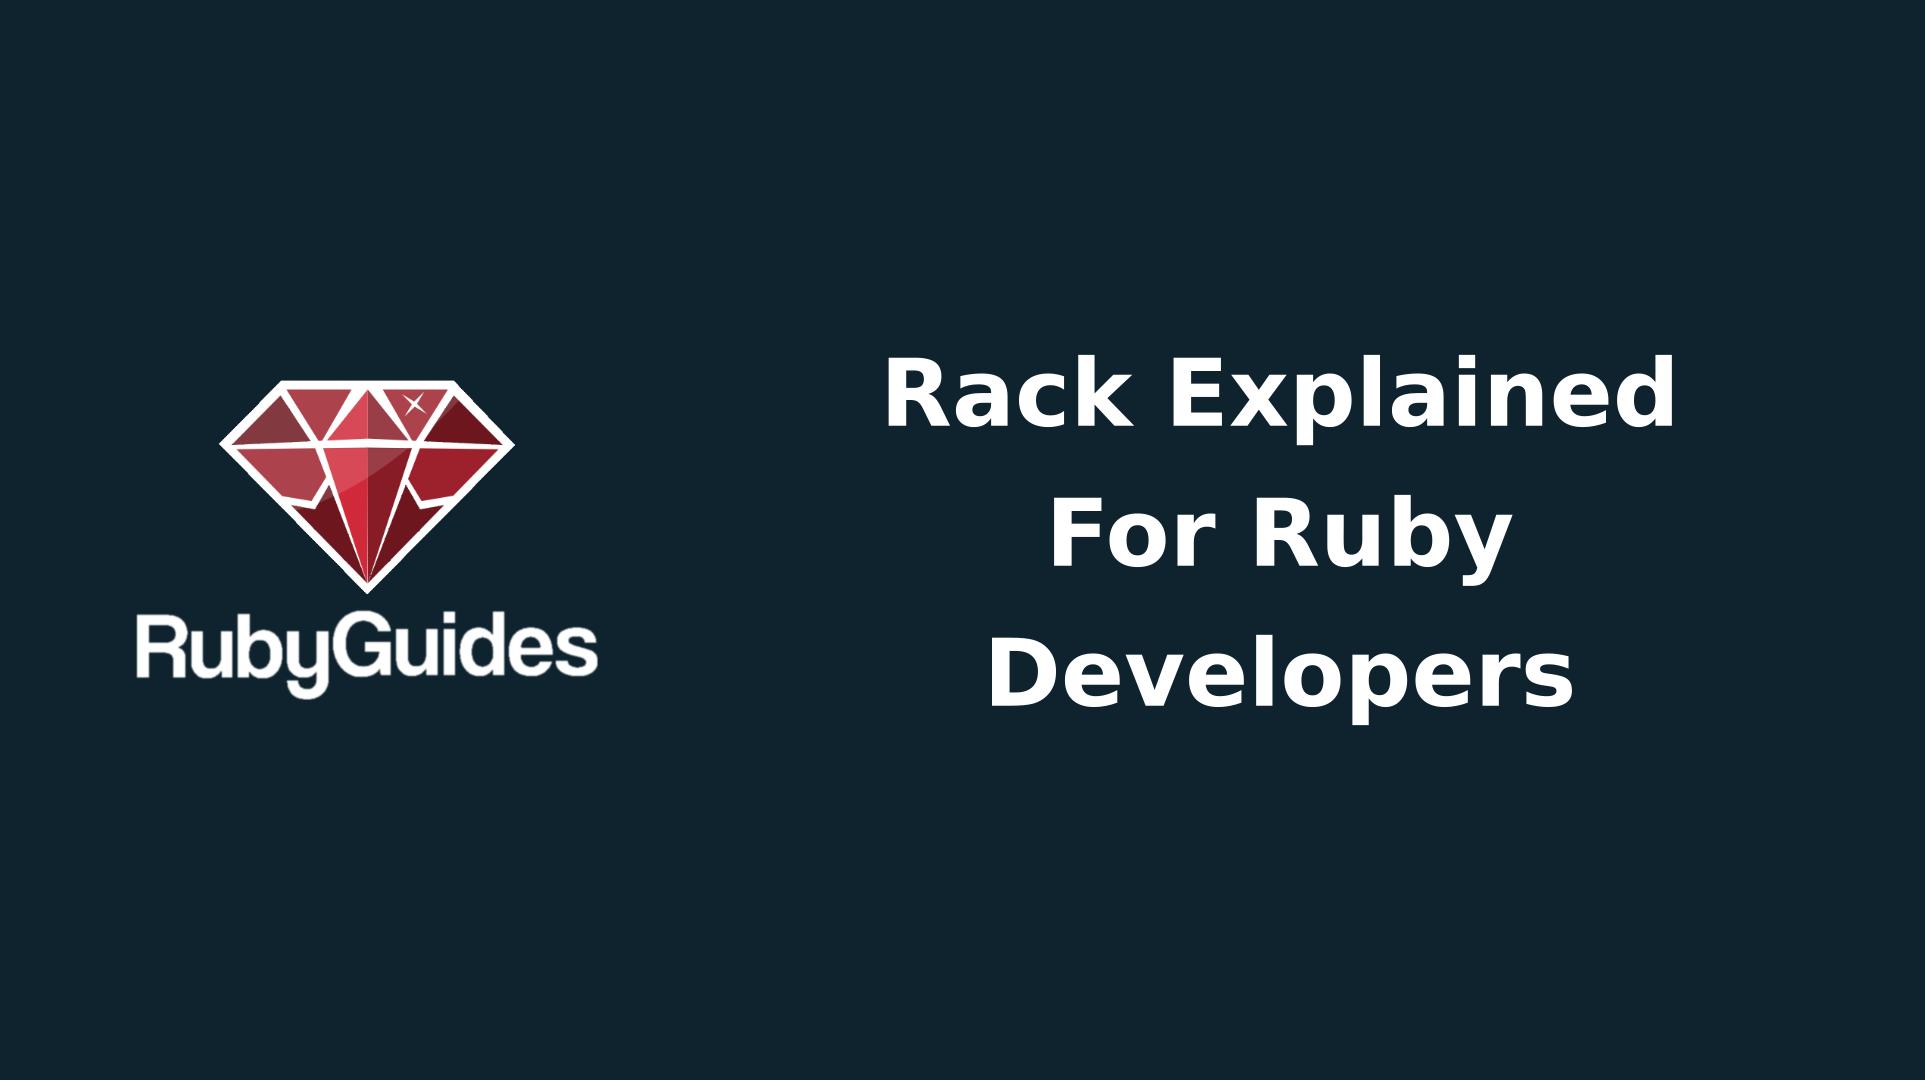 Rack Explained For Ruby Developers - RubyGuides